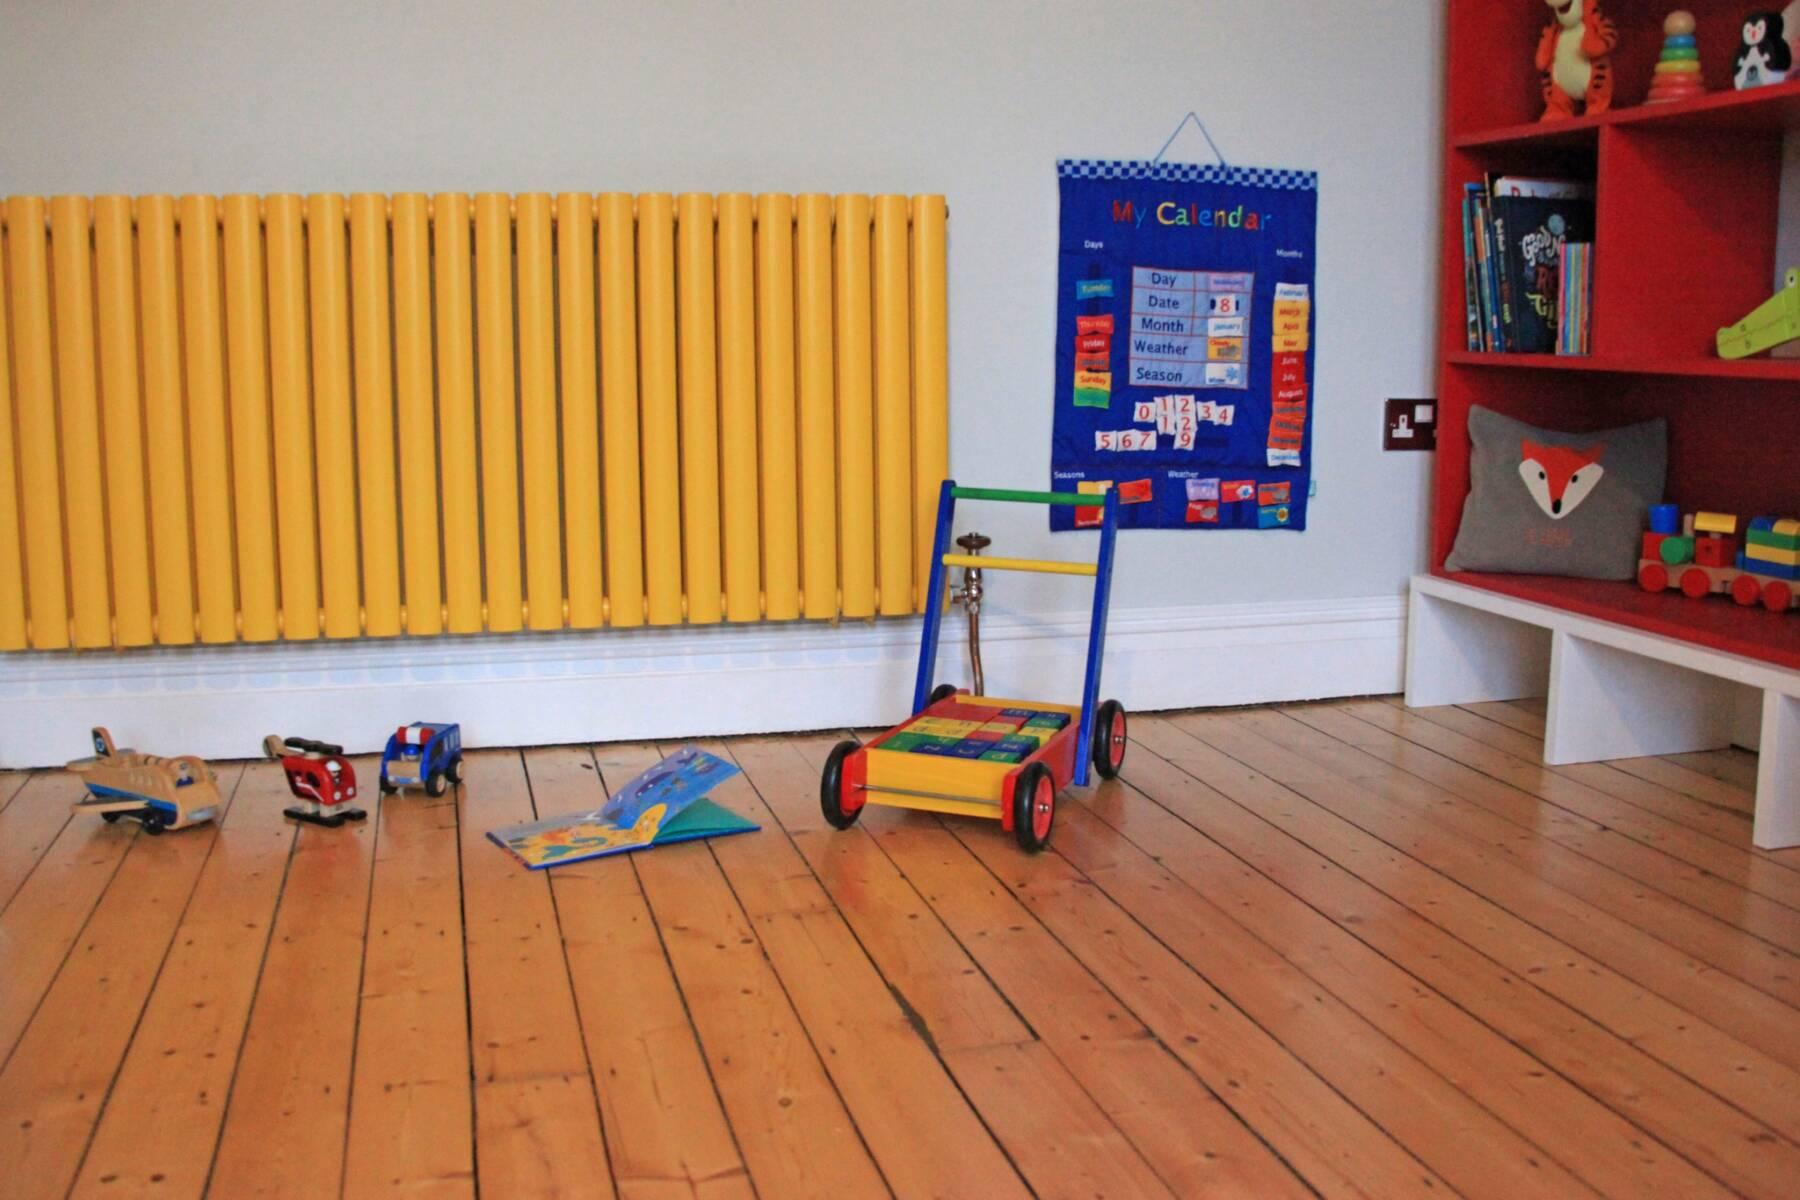 yellow radiator in a playroom